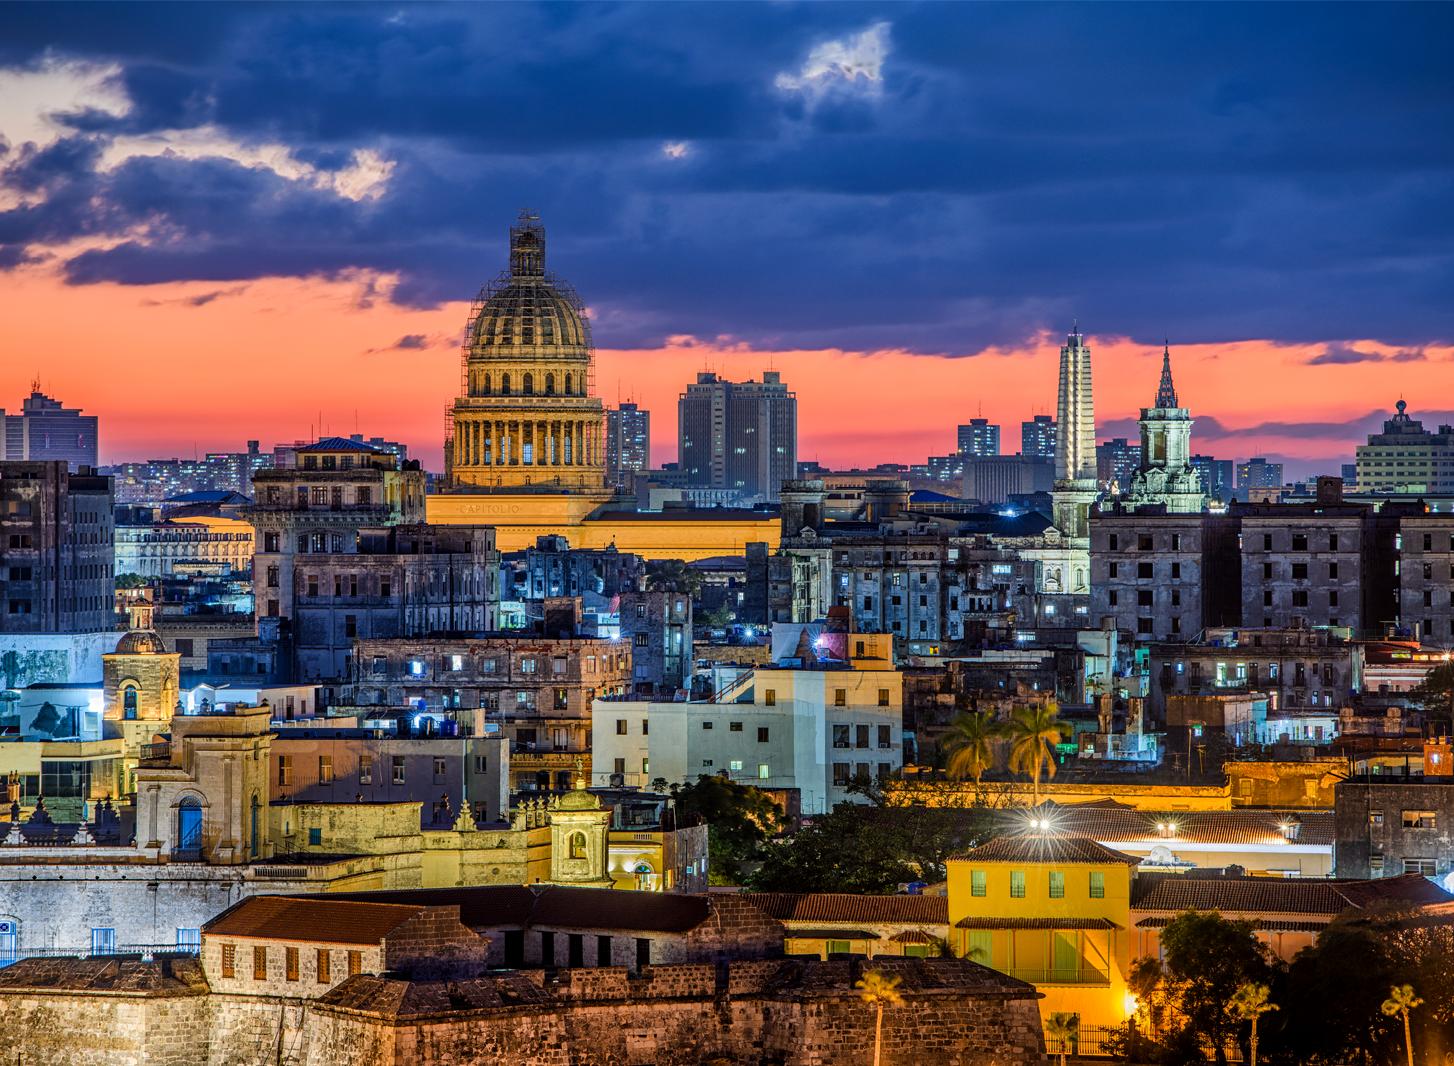 This is an image of Havana, Cuba